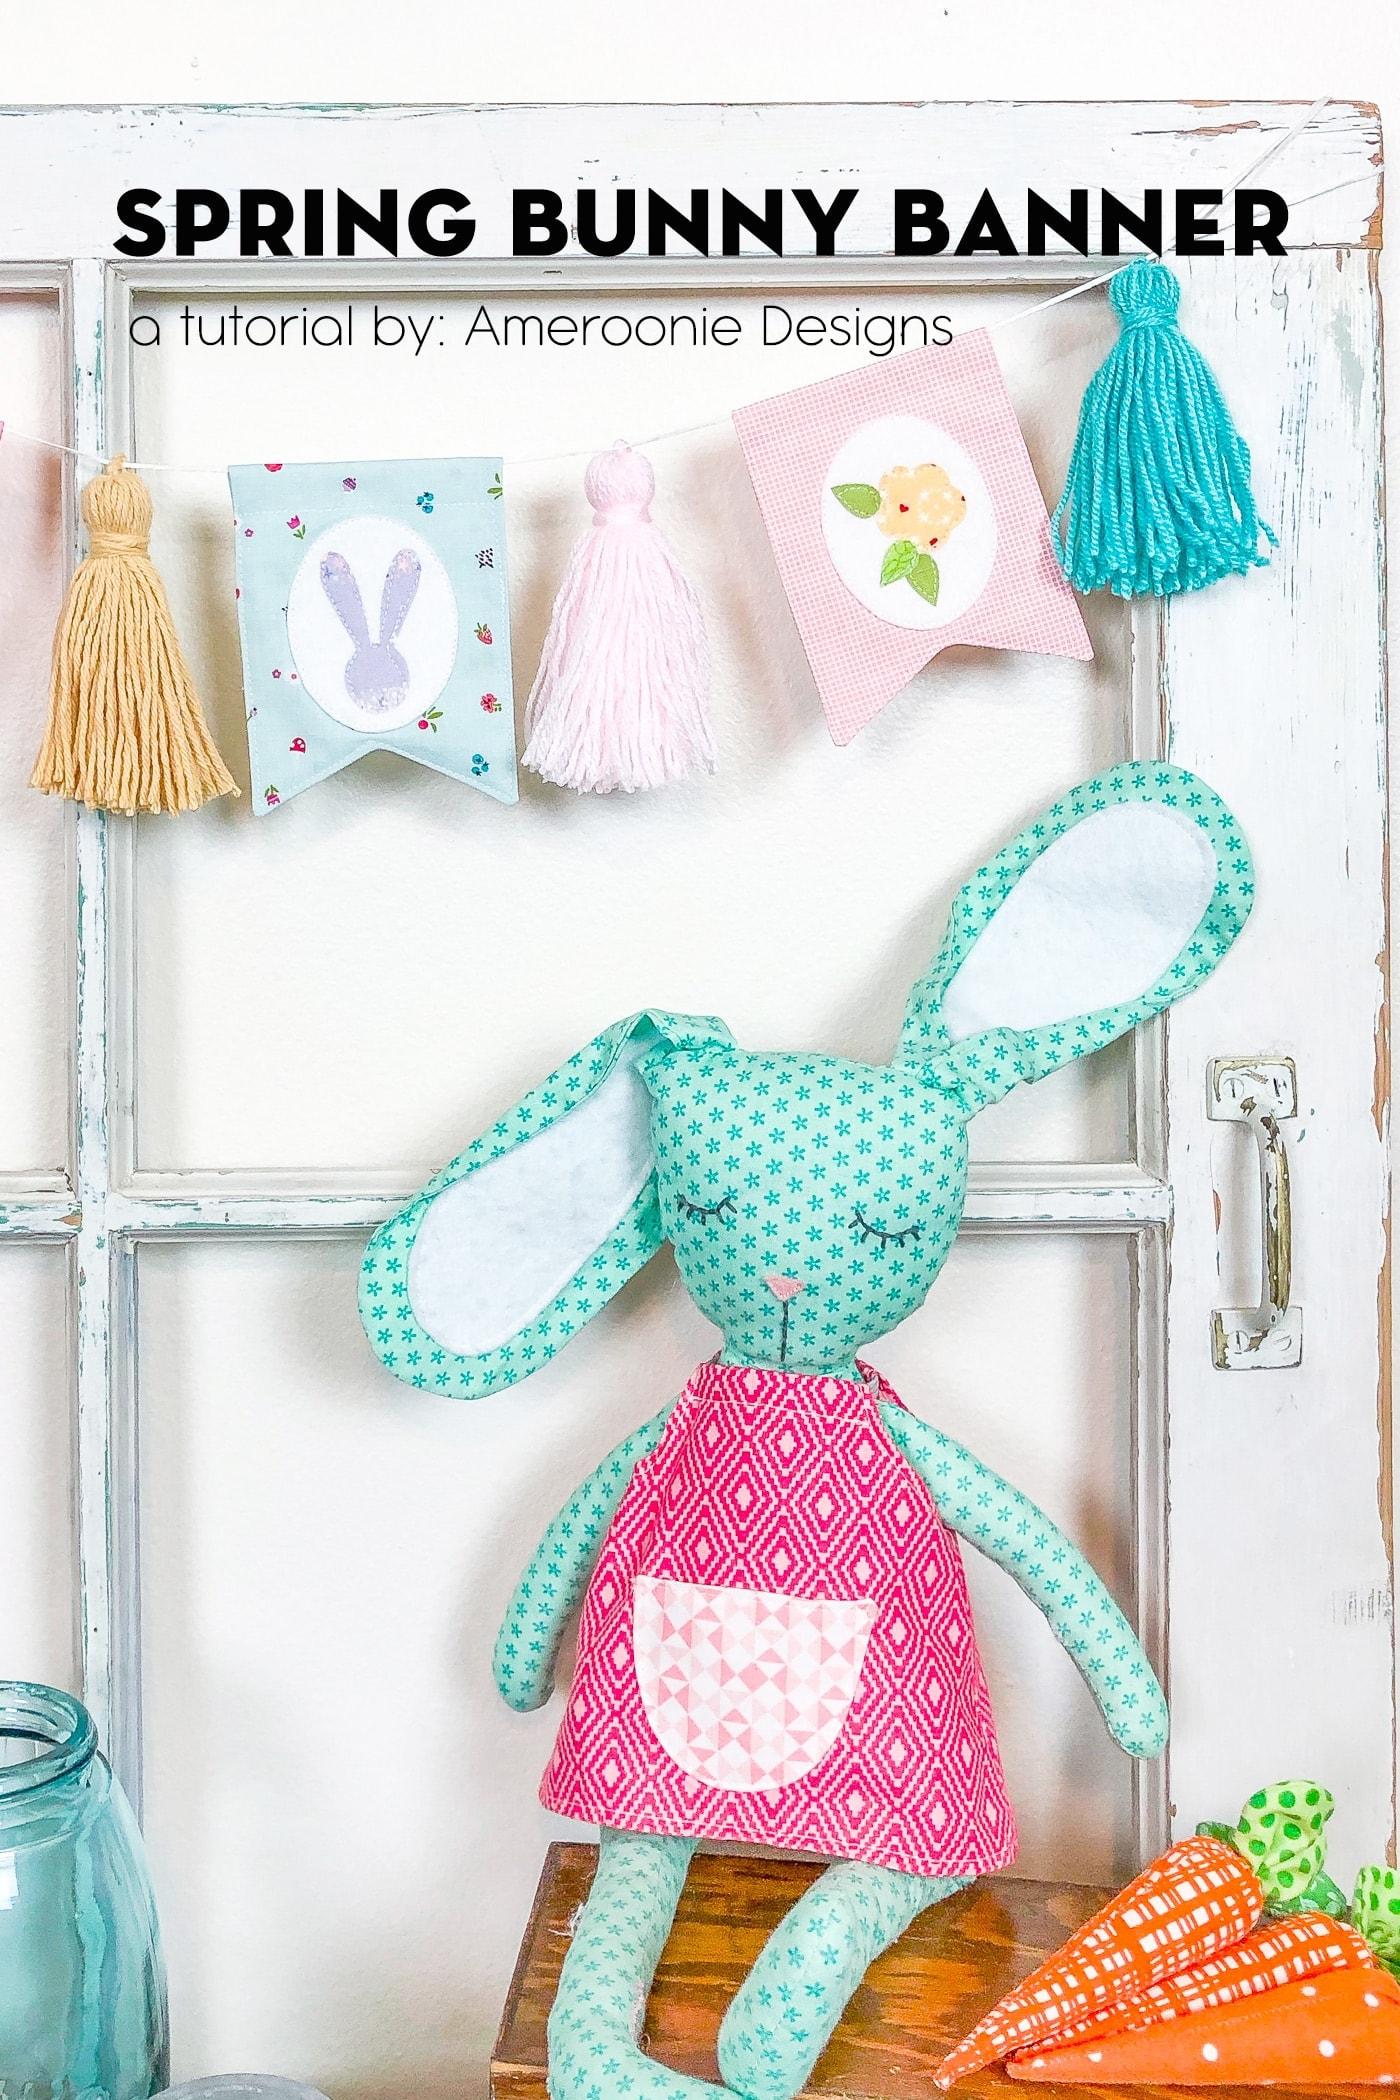 Spring Bunny Banner Tutorial